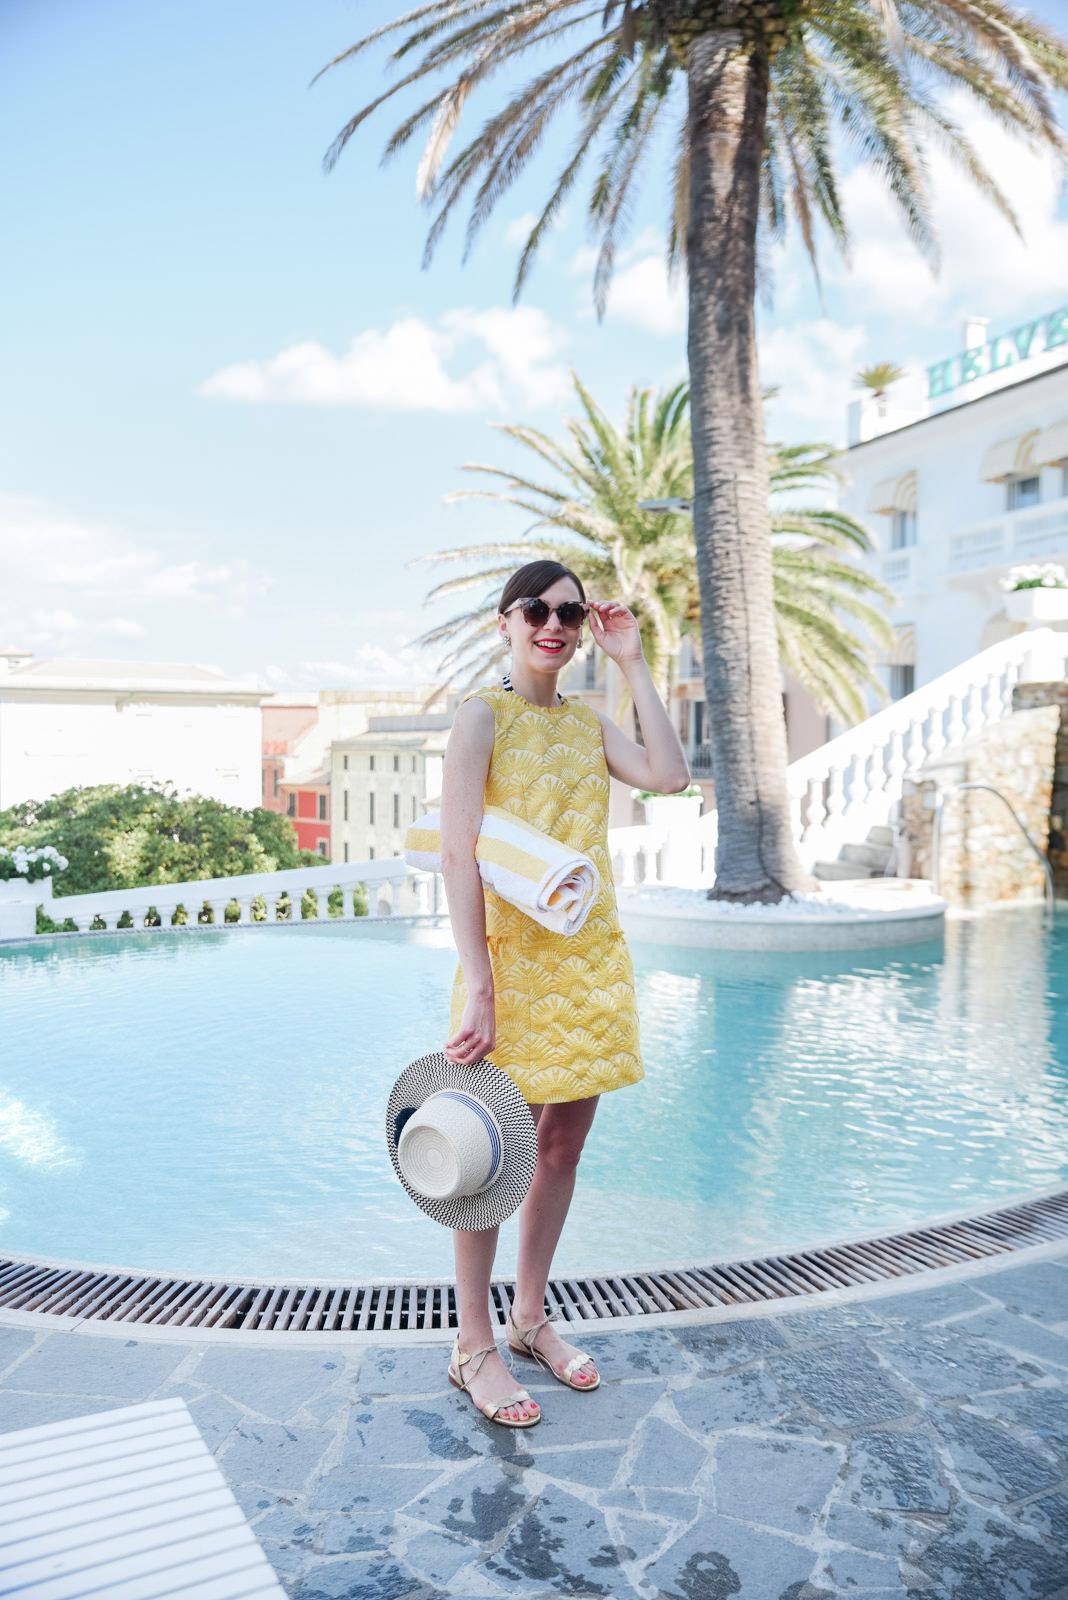 Blog-Mode-And-The-City-Lifestyle-Italie-Sestri-Levante-Cinque-Terre-8